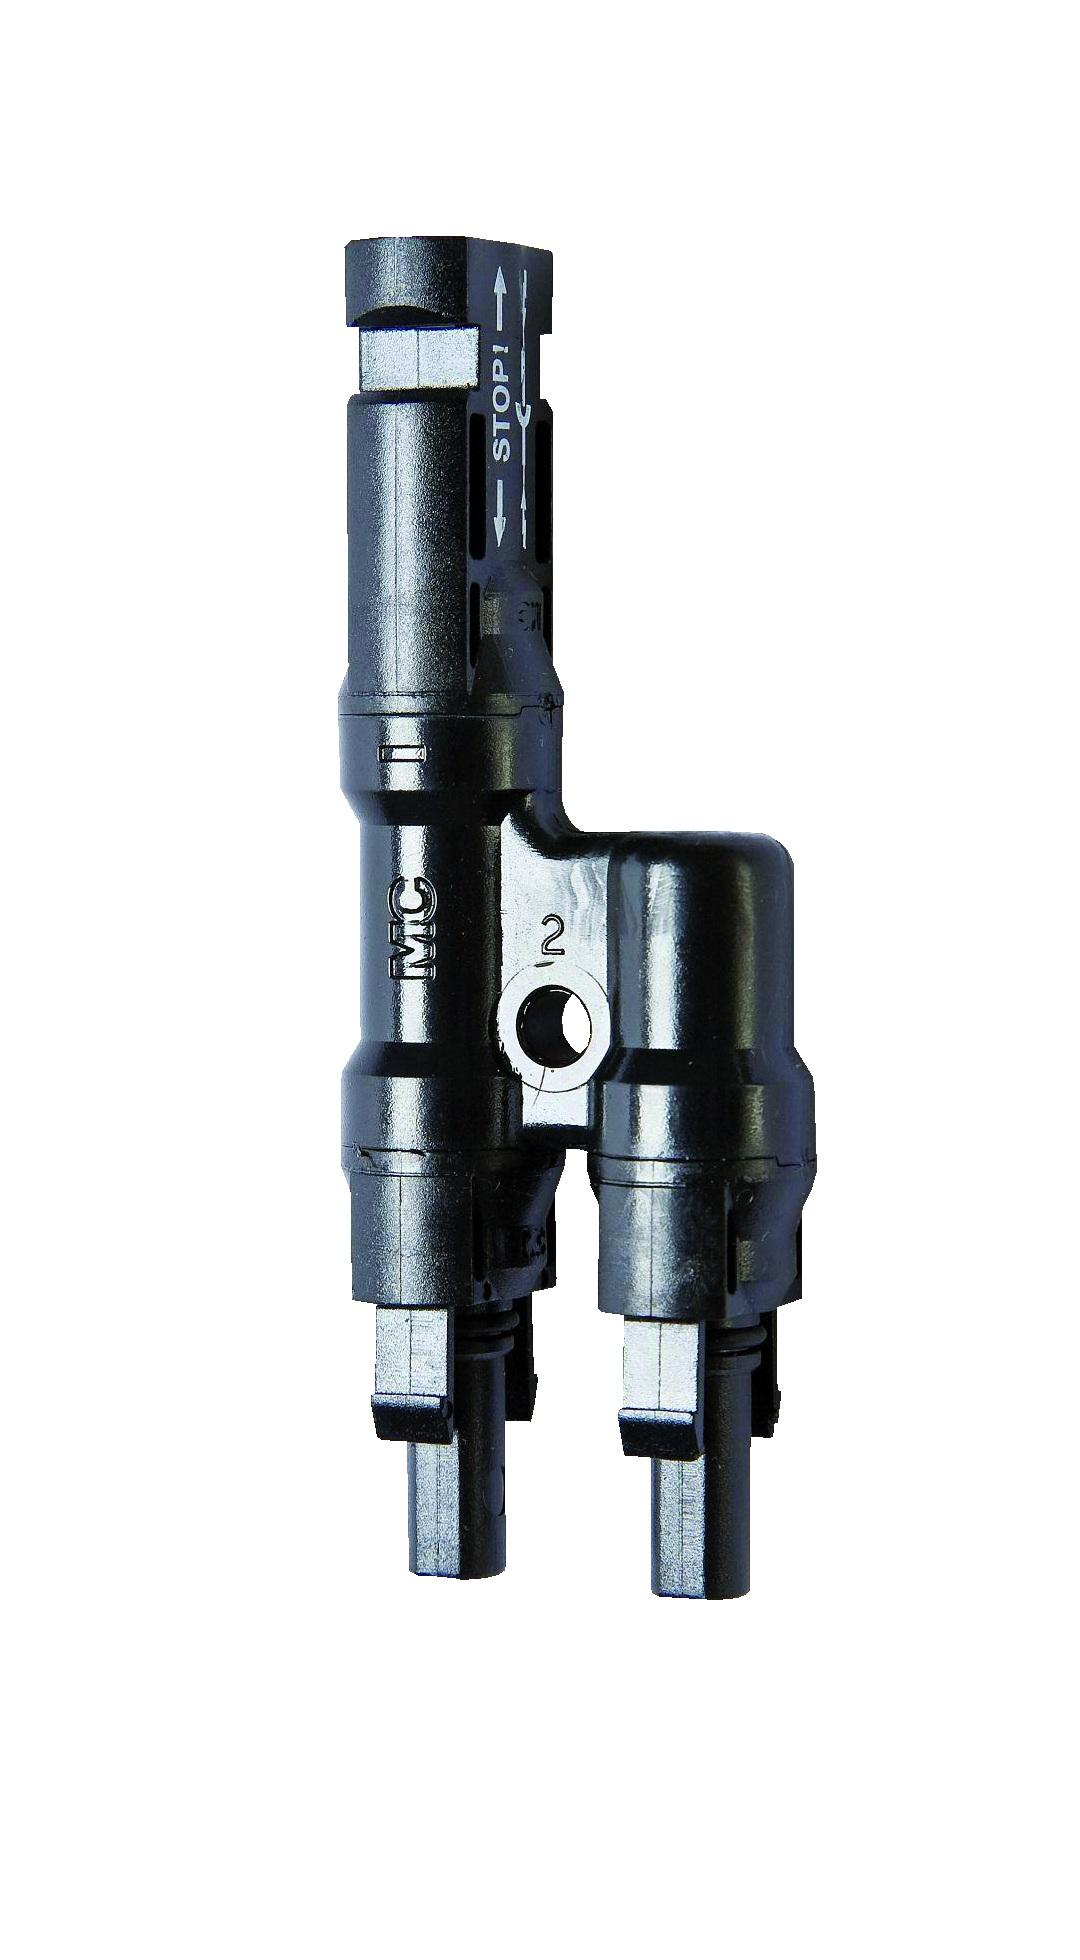 1 Stk Abzweigbuchse MC4, Bemessungstrom 30A bei 4-6mm²-Kabeln PVA16000--